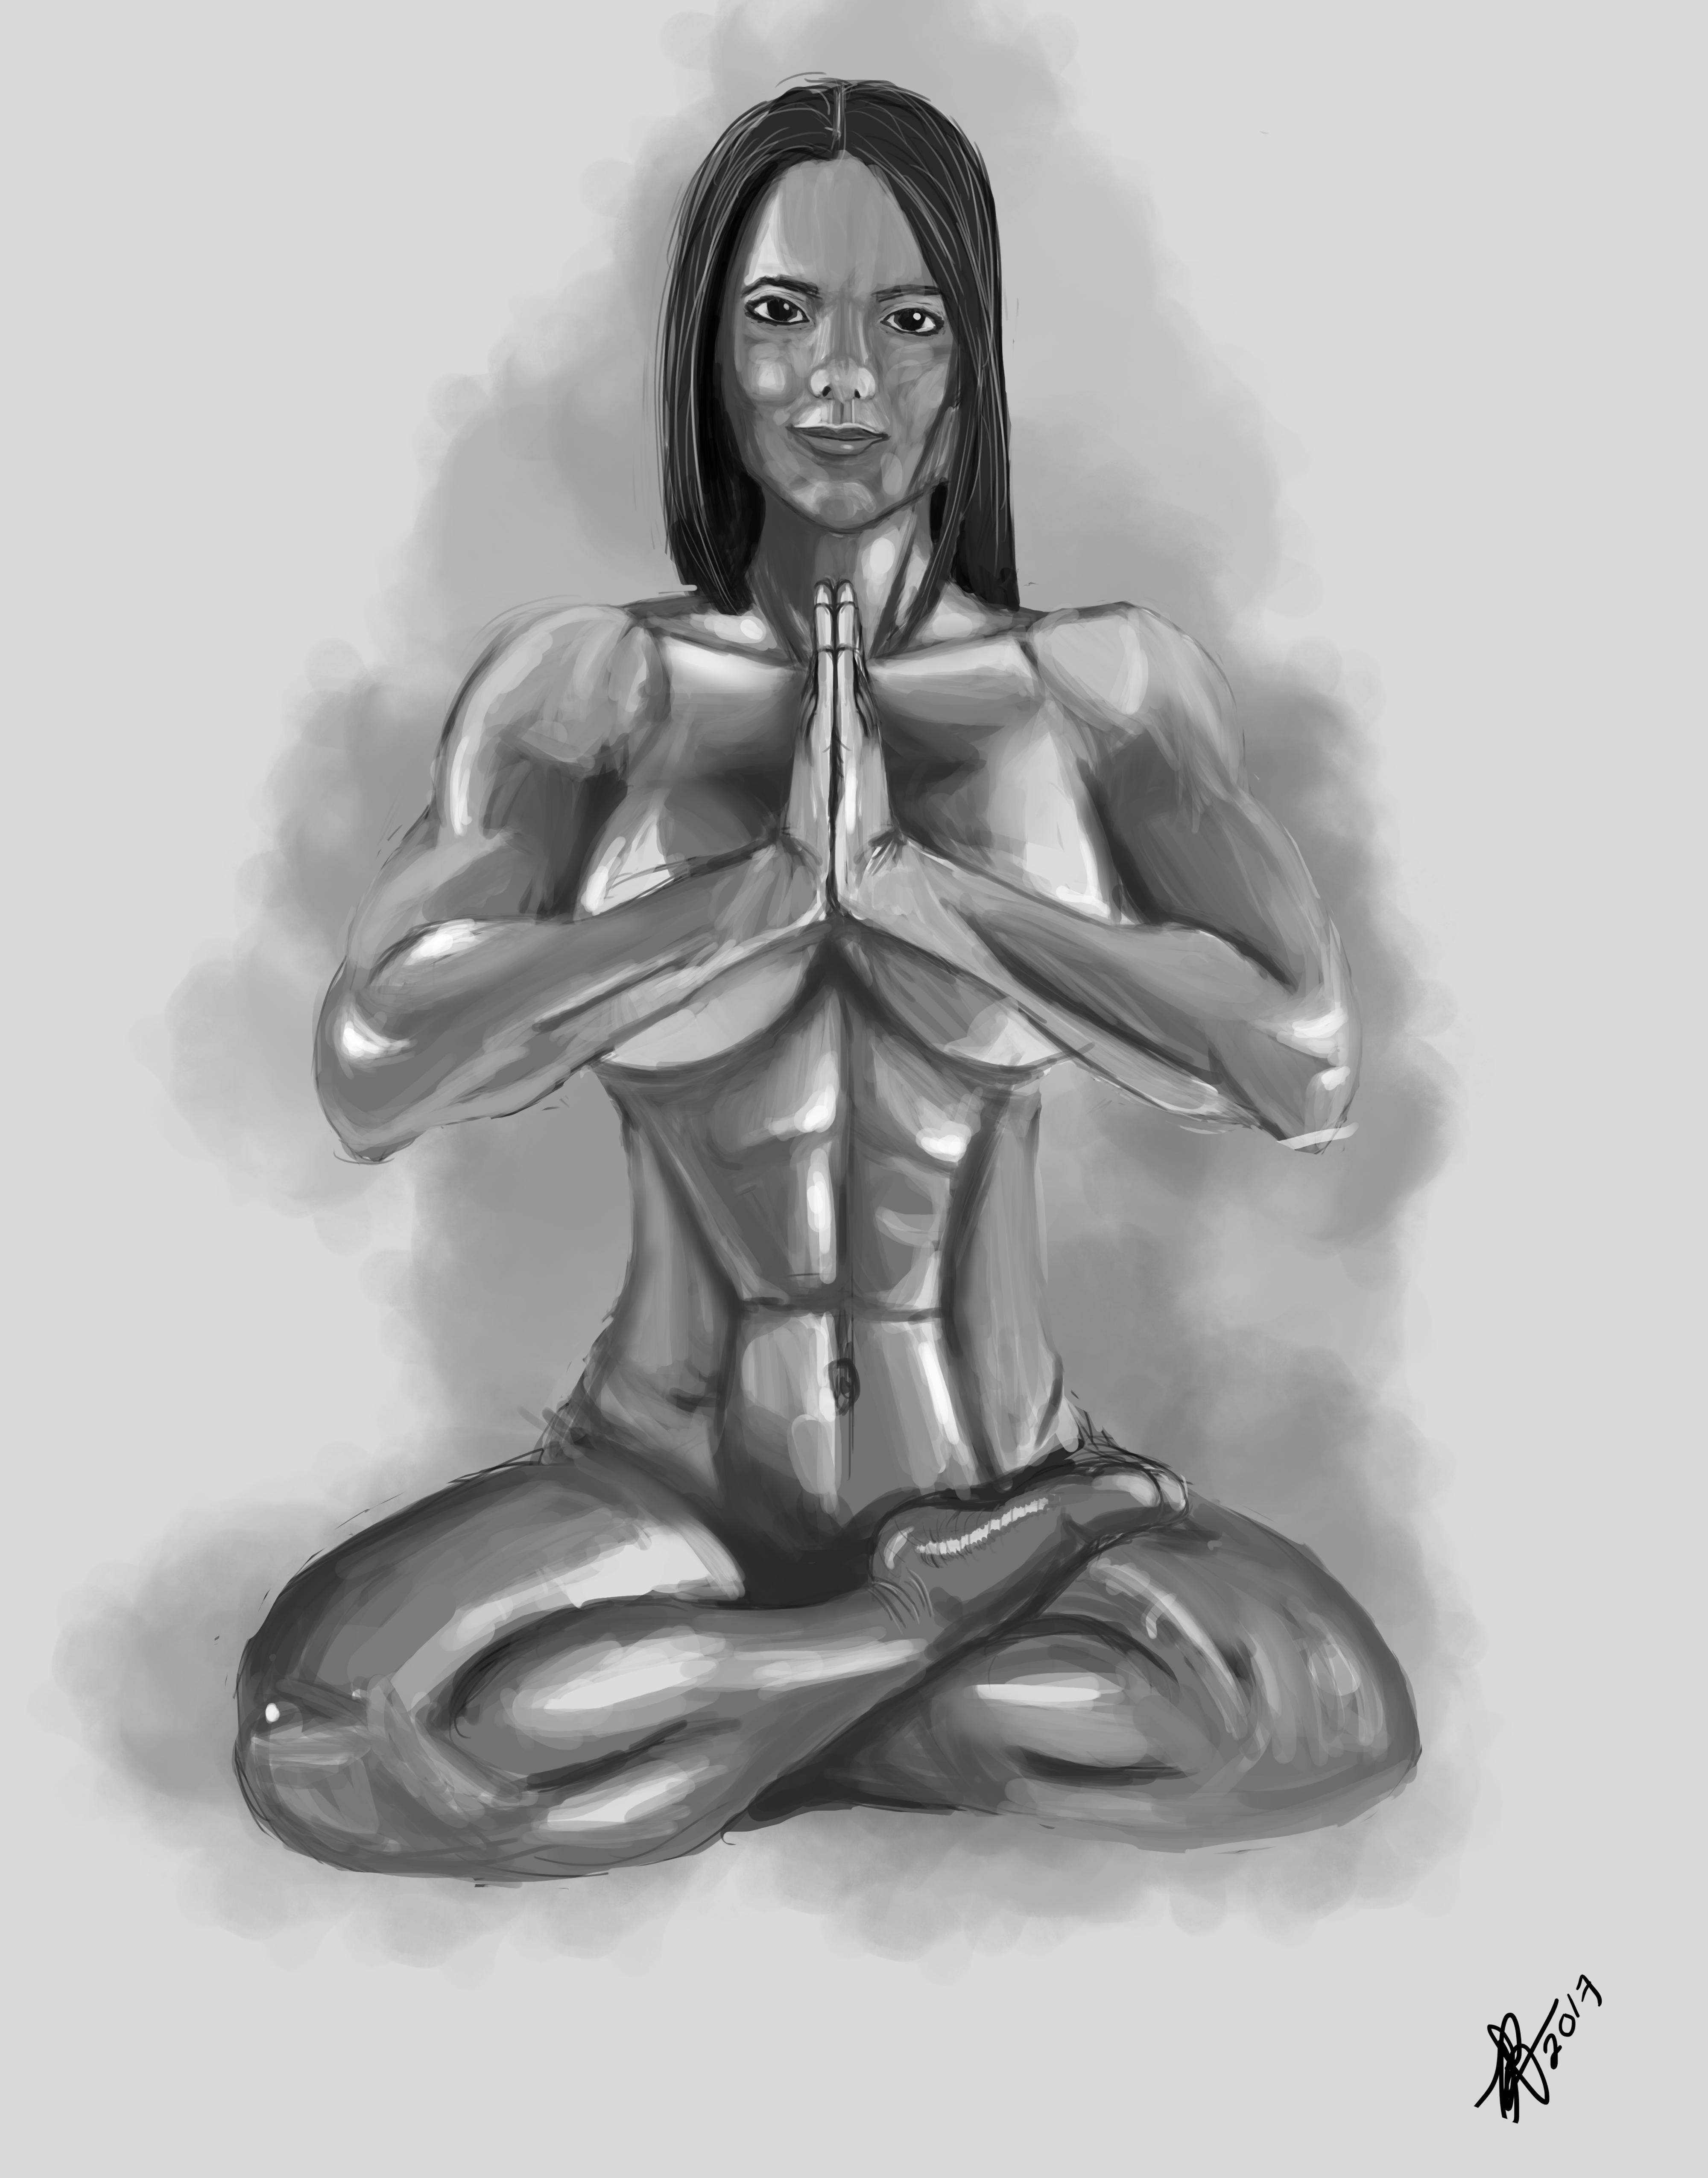 Gray anatomy